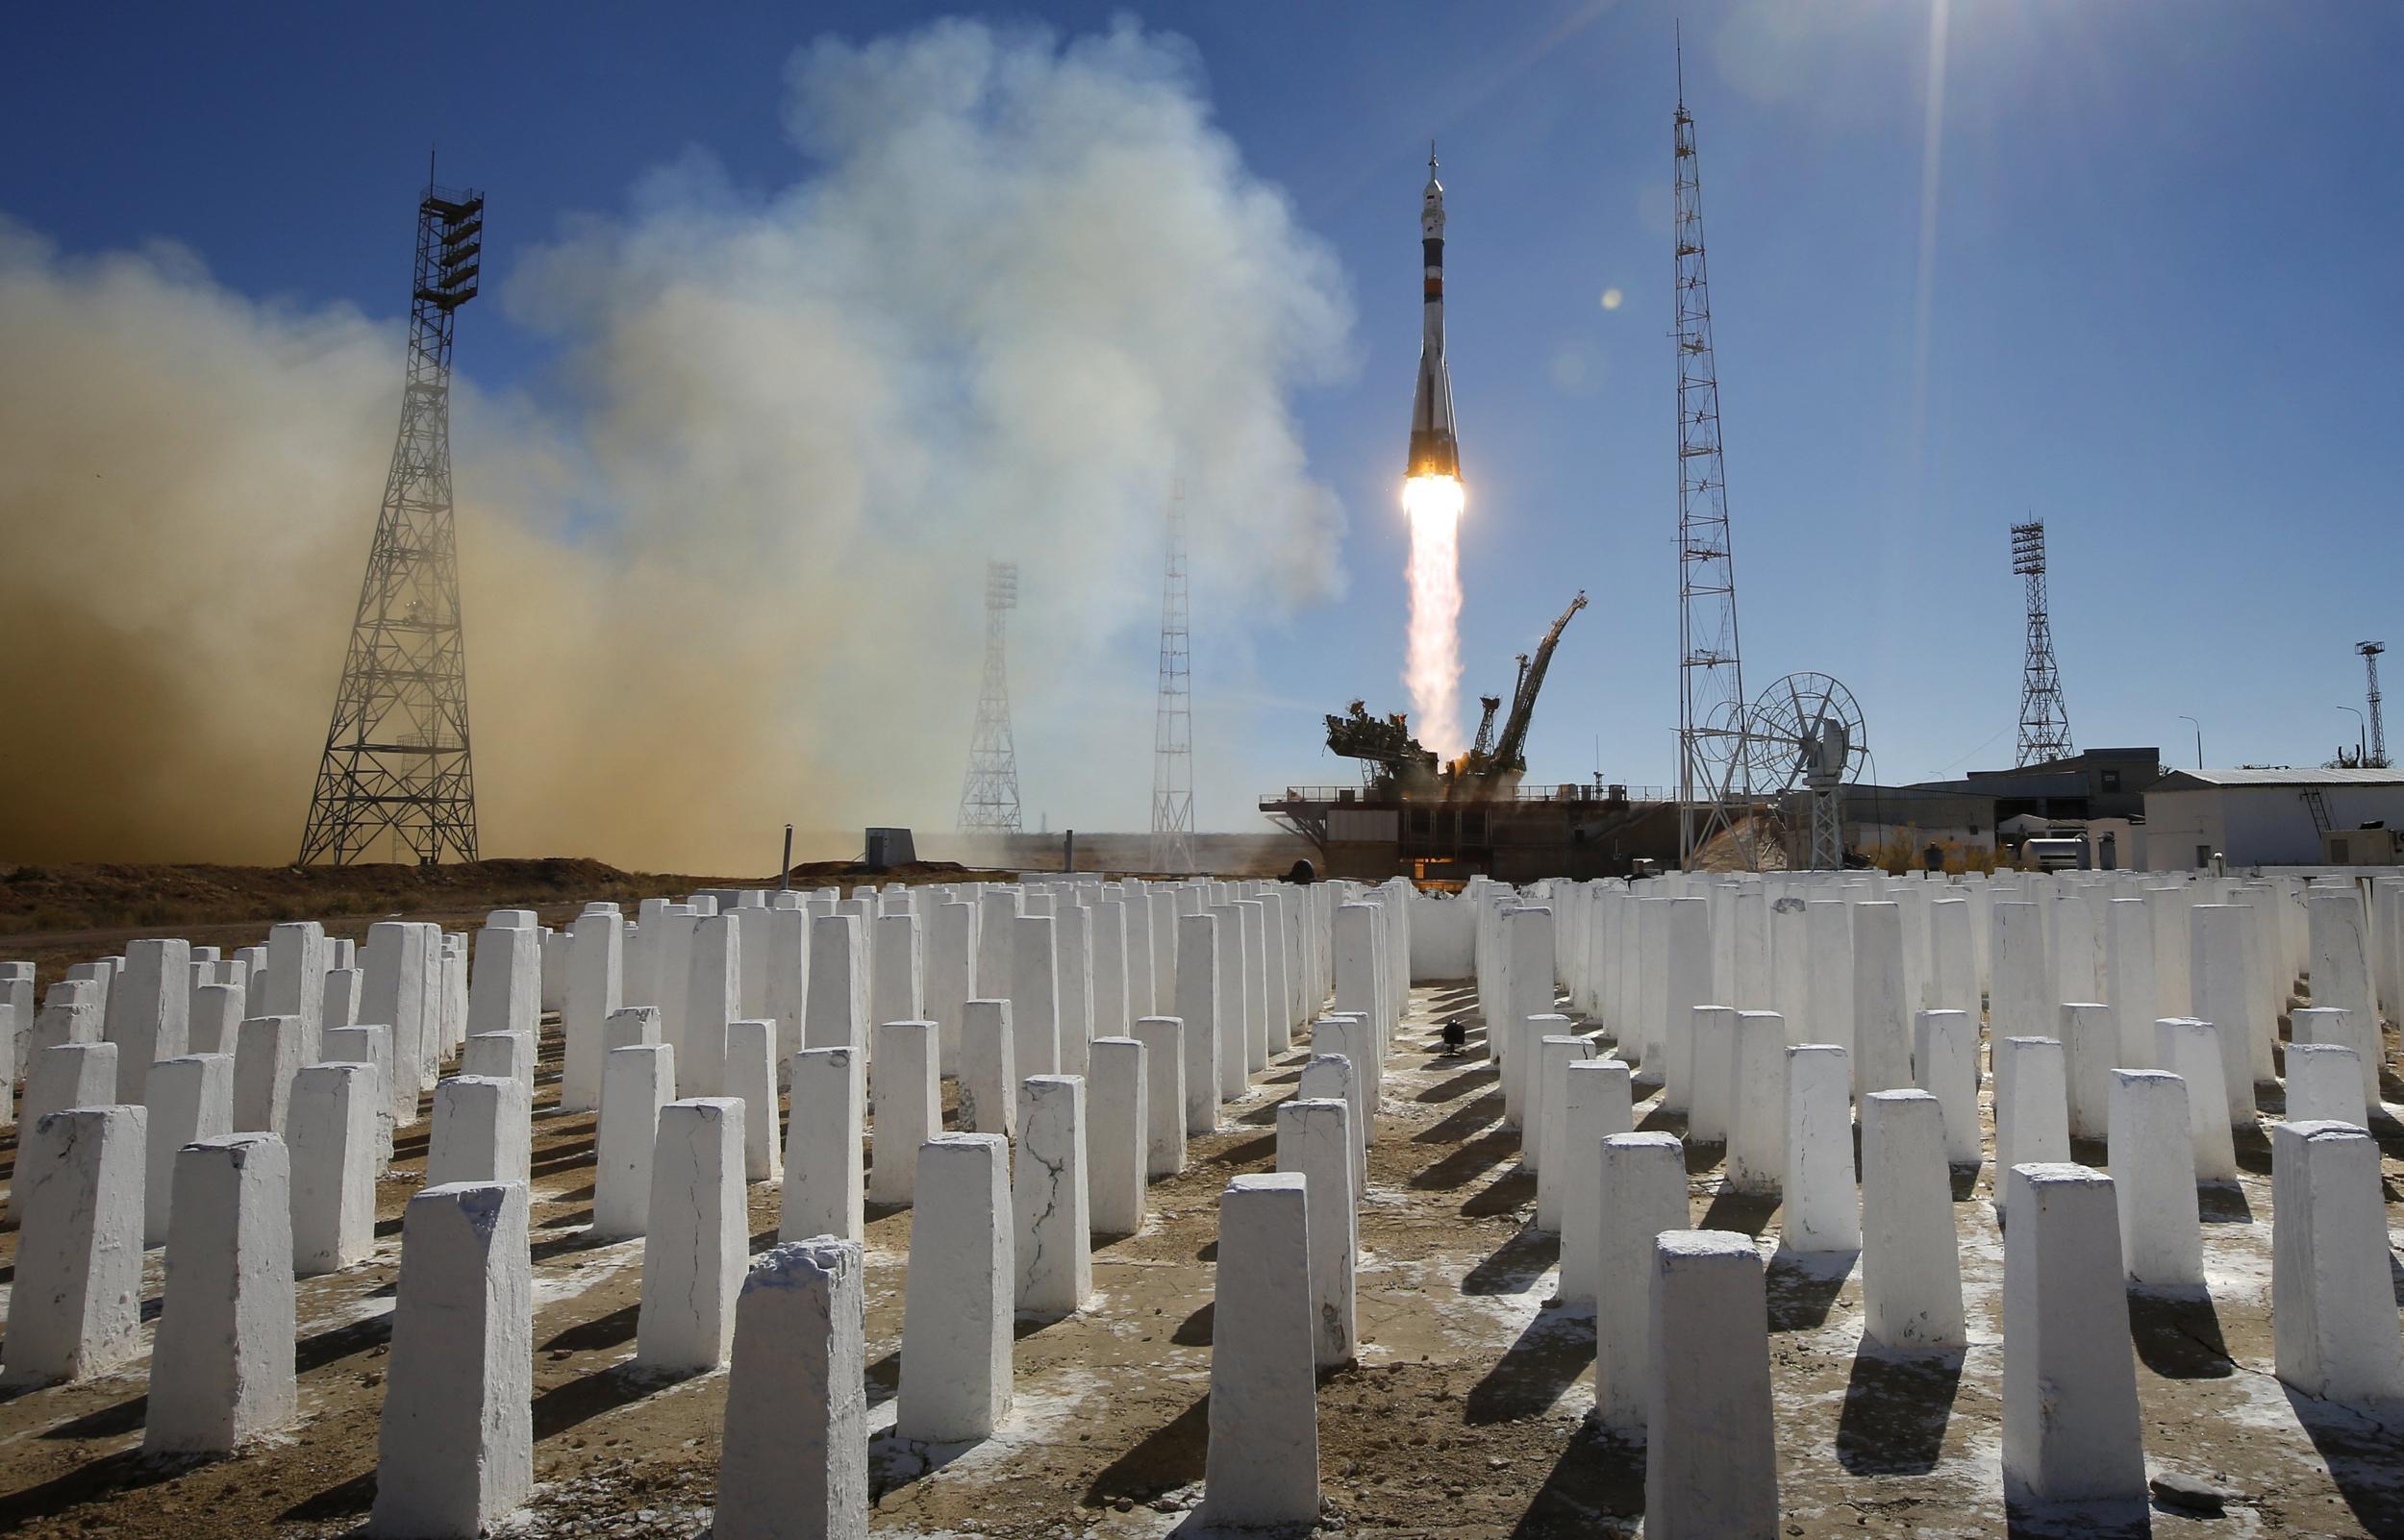 Soyuz-astronauts'-emergency-descent-was-a-harrowing,-high-G-ordeal